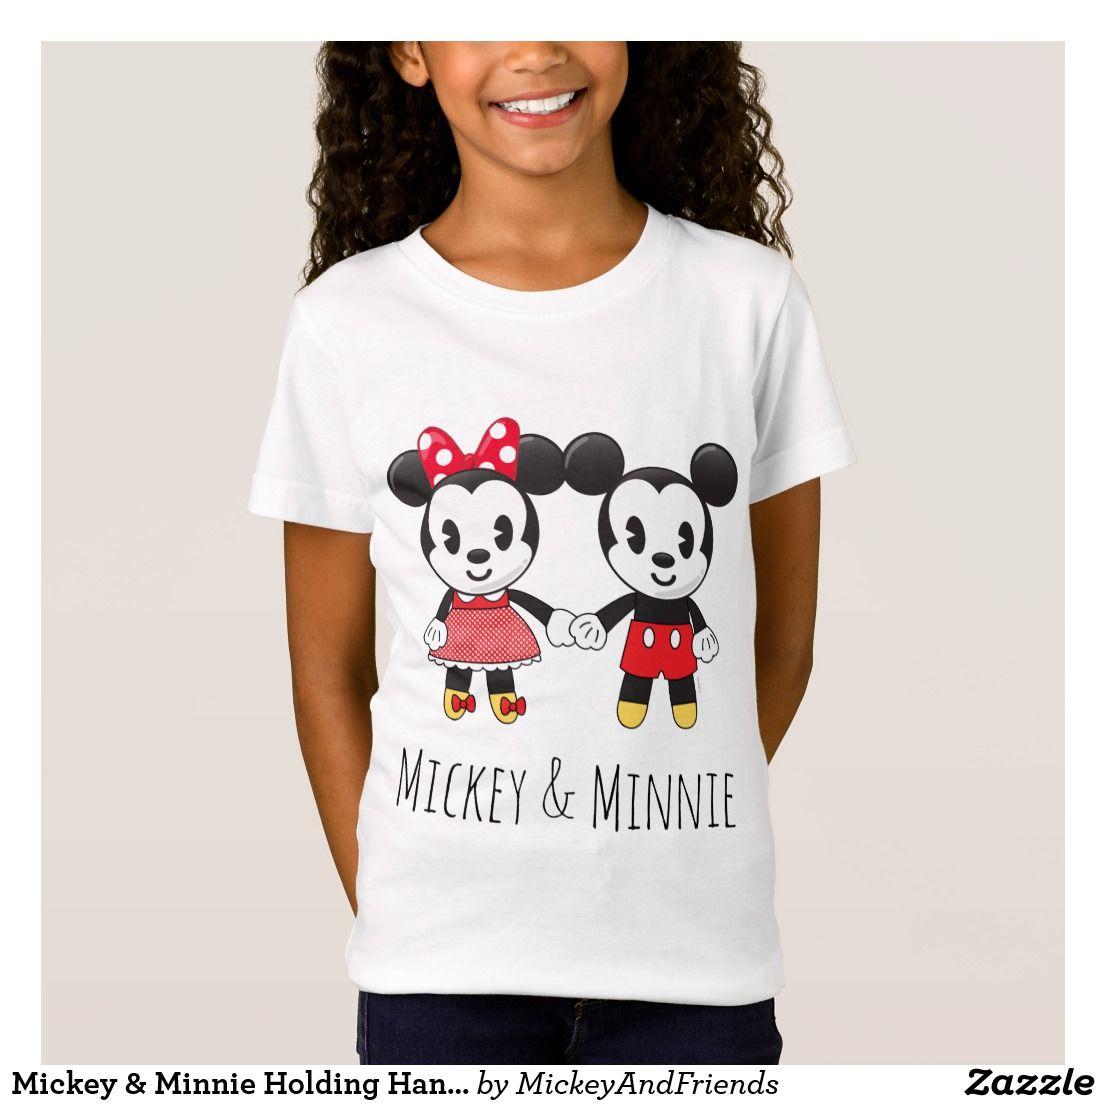 bc5dec459 Mickey & Minnie Holding Hands Emoji 2 T-Shirt #minniemouse #disney  #mickeyshirts #mickemouse minnie mouse mickey mouse snacks ideas mickey  mouse parties ...